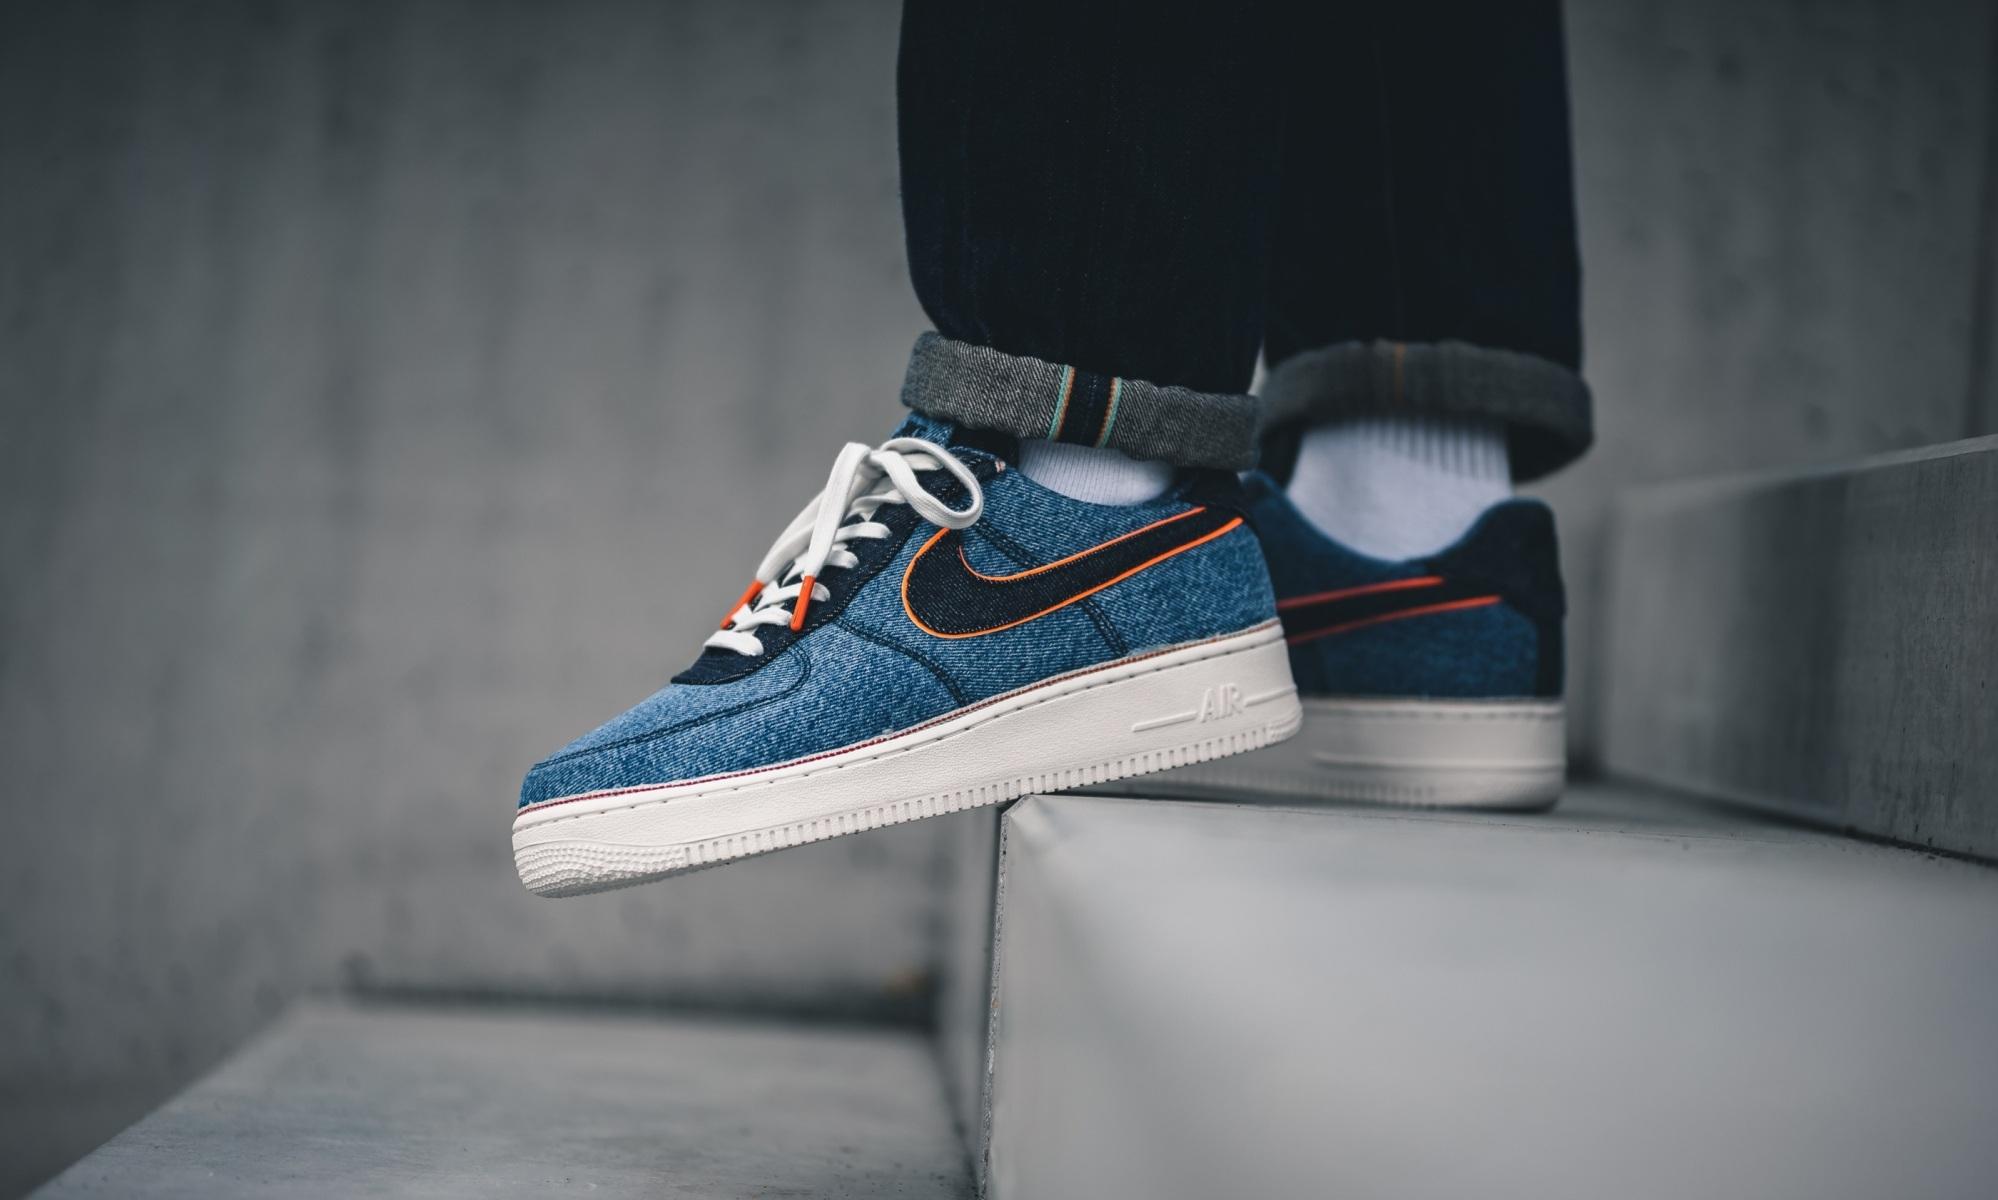 Nike x 3×1 Air Force 1 Stonewash Blue